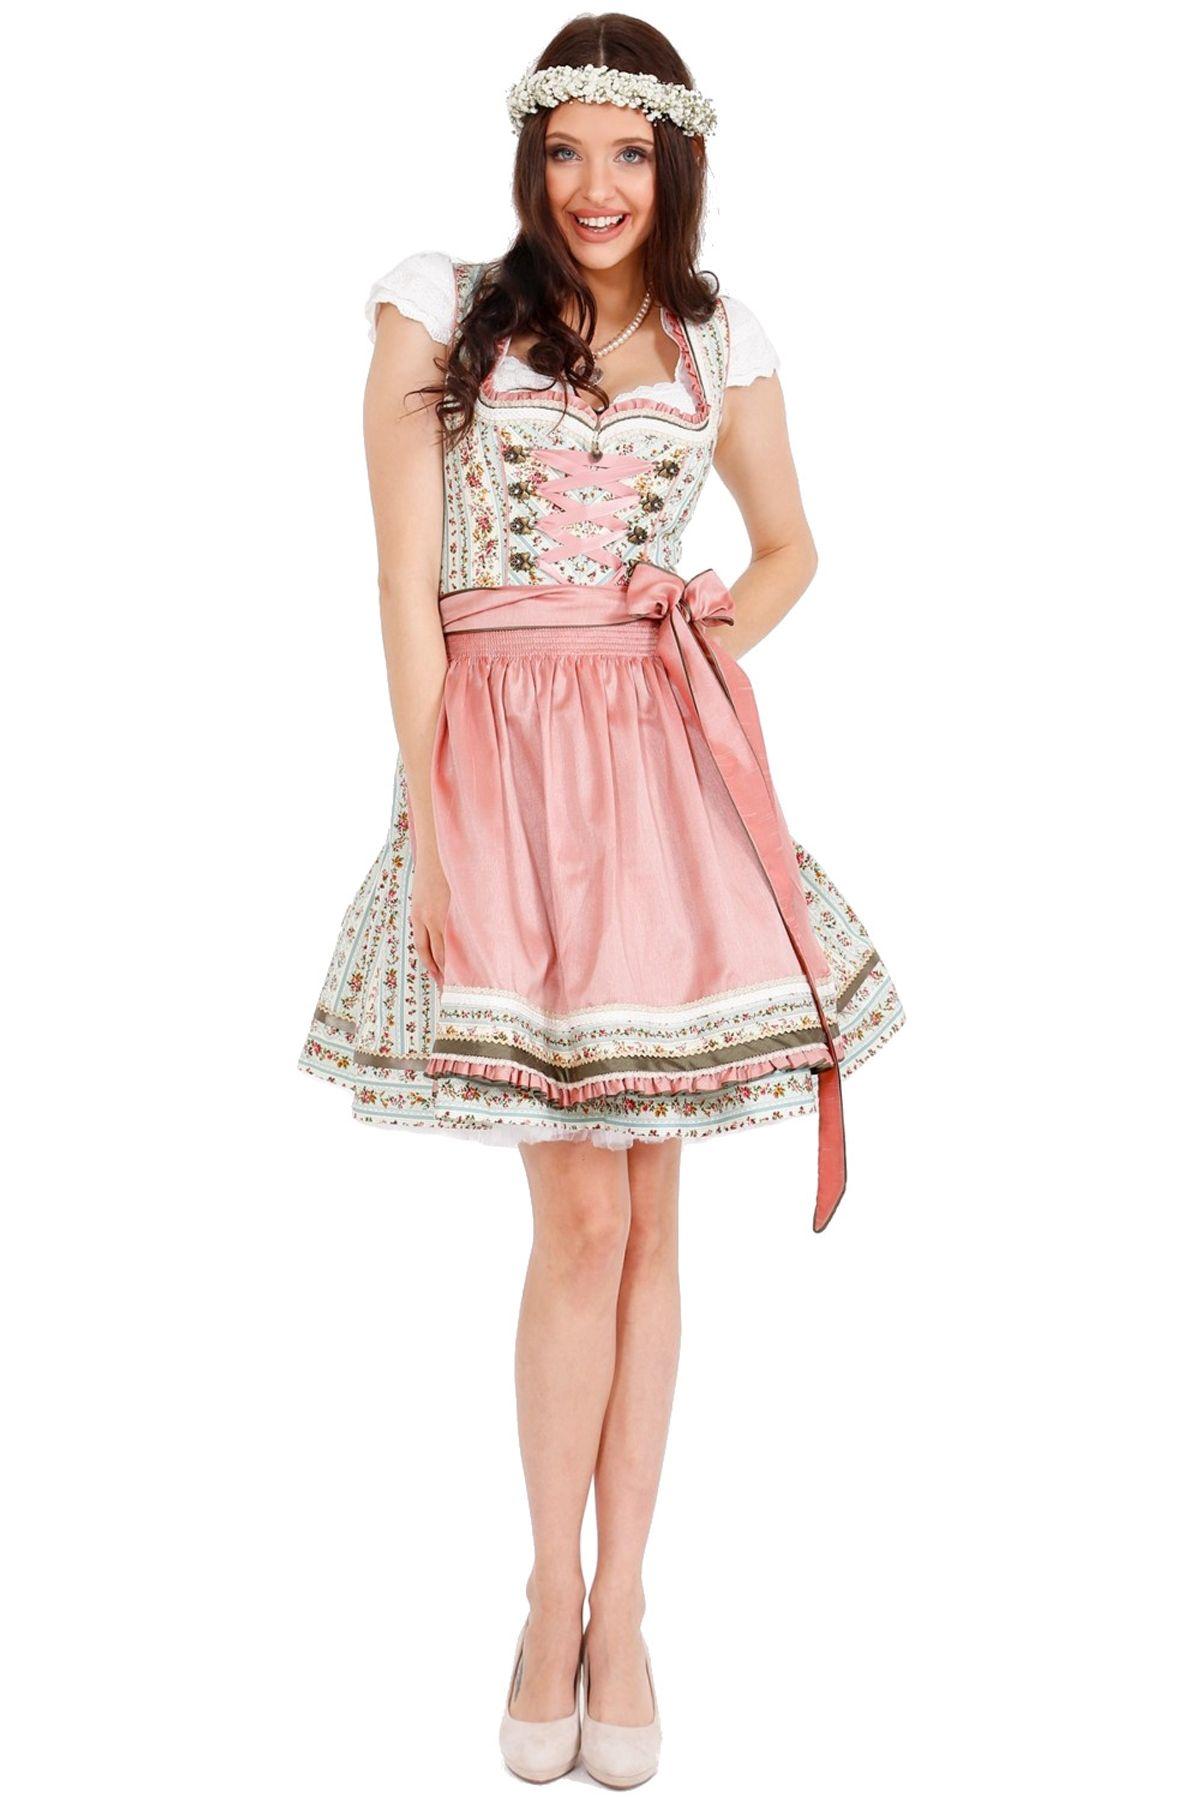 50cm Damen Trachten Dirndl in rose Dirndl Elva 46725-233 Krüger